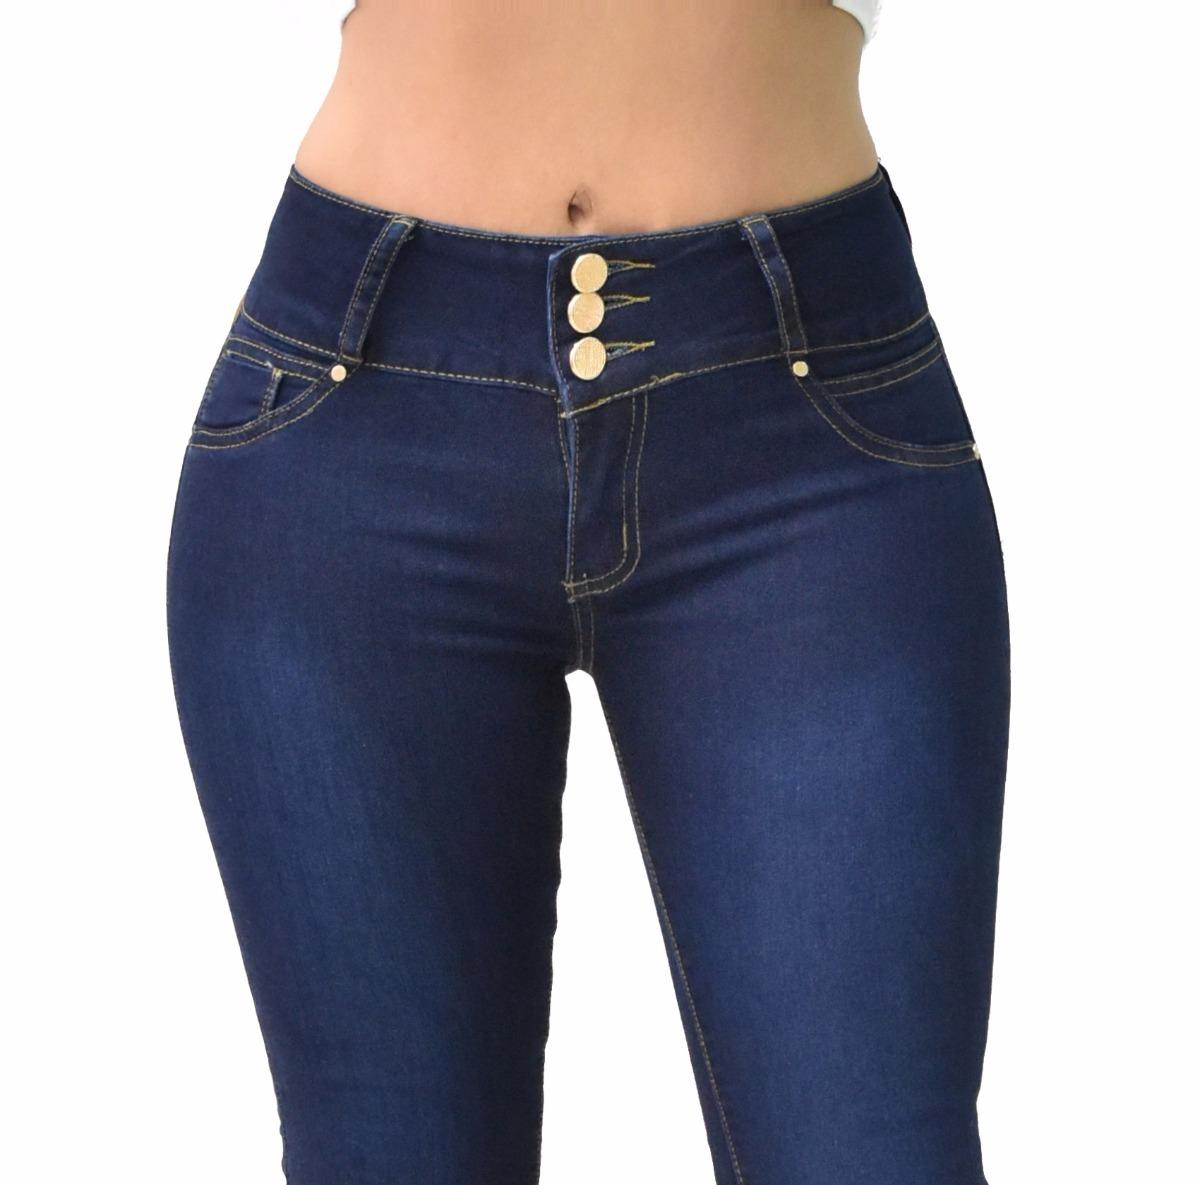 398007c2af9 pantalones colombianos jeans dama mezclilla push up v-f33. Cargando zoom.